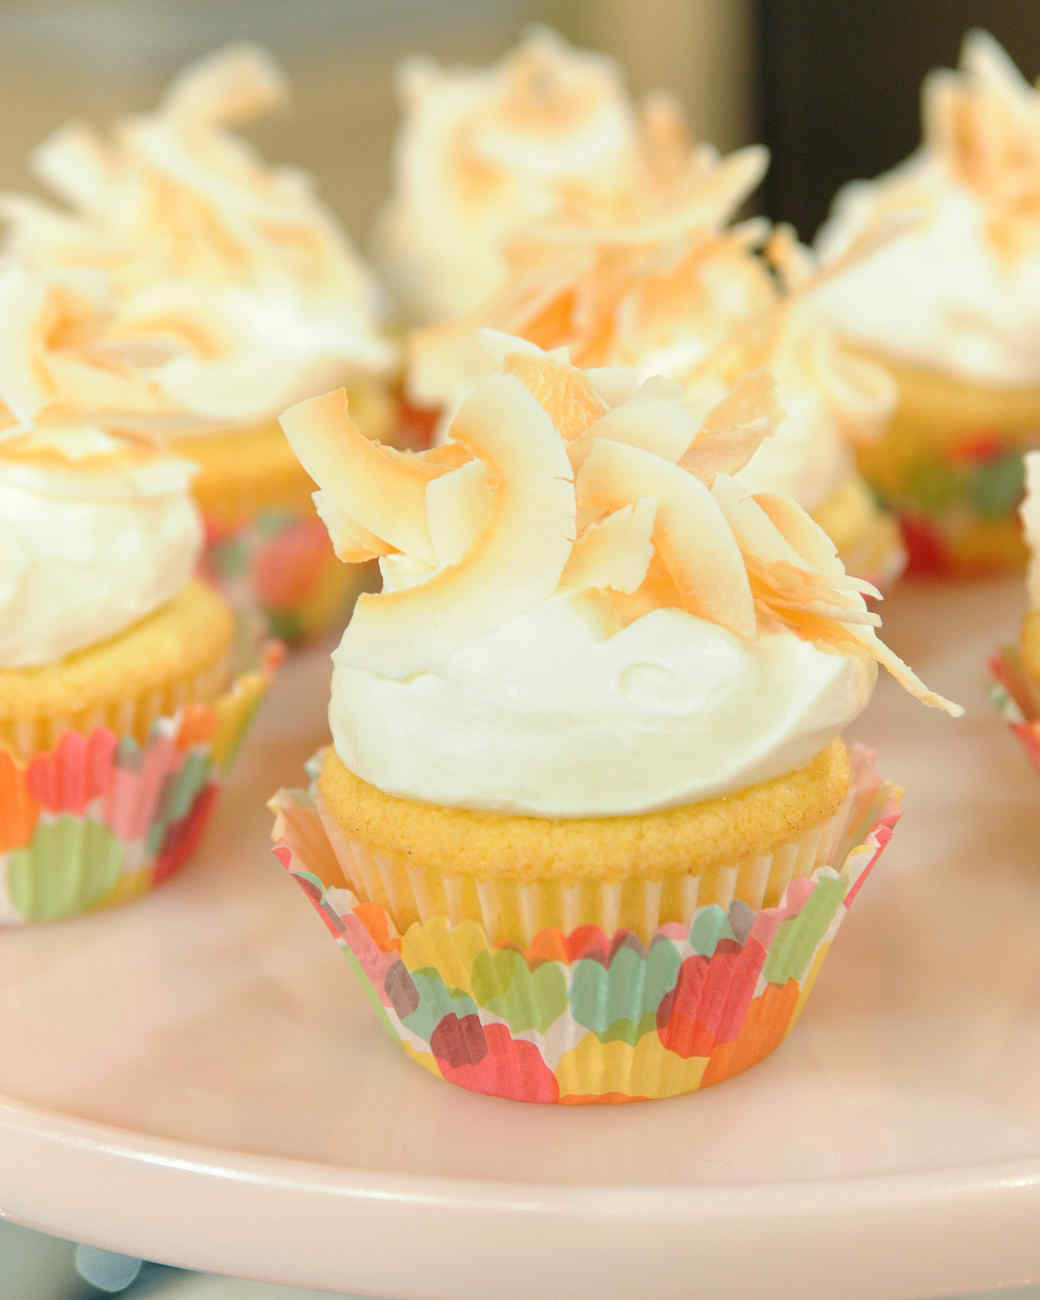 coconut-cream-cupcakes-mslb7002.jpg